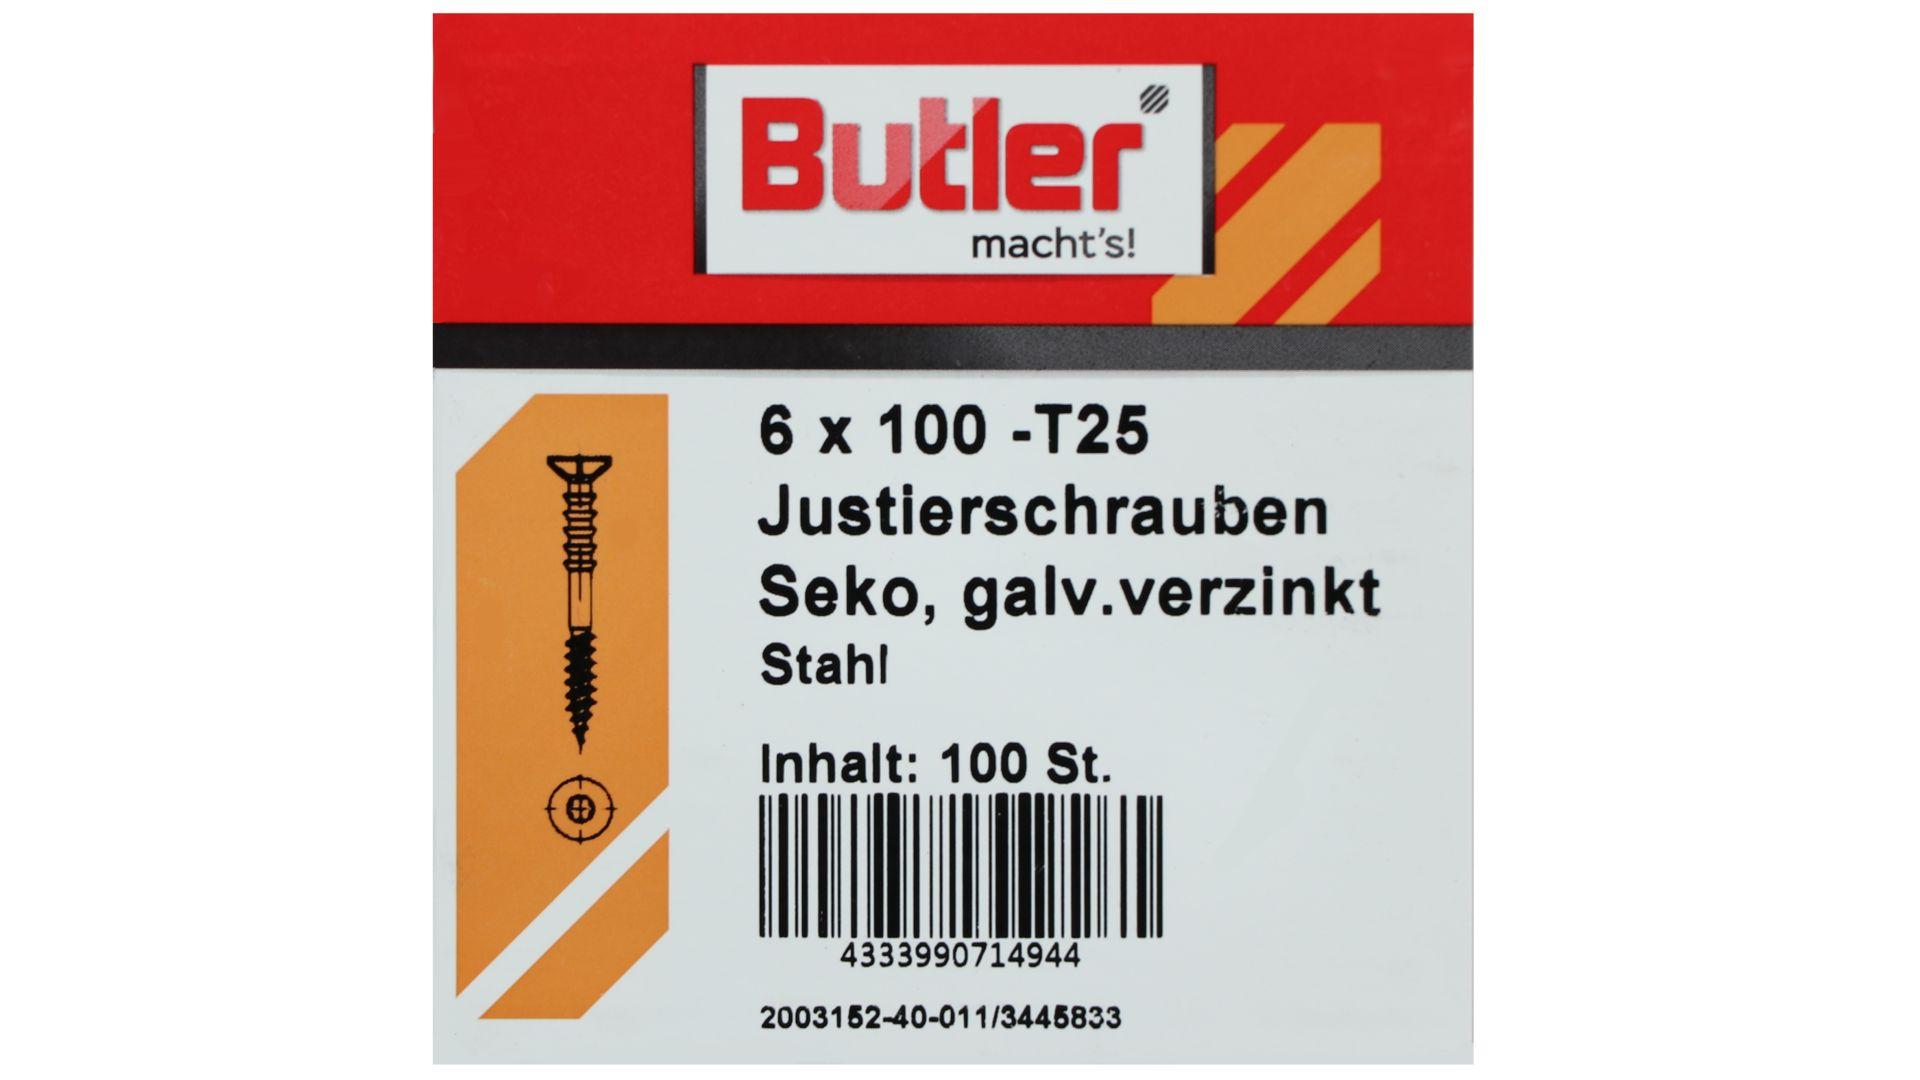 Butler macht's! Justierschraube, Stahl, Senkkopf, galvanisch verzinkt, T25, 6 x 100 mm, 100 Stück